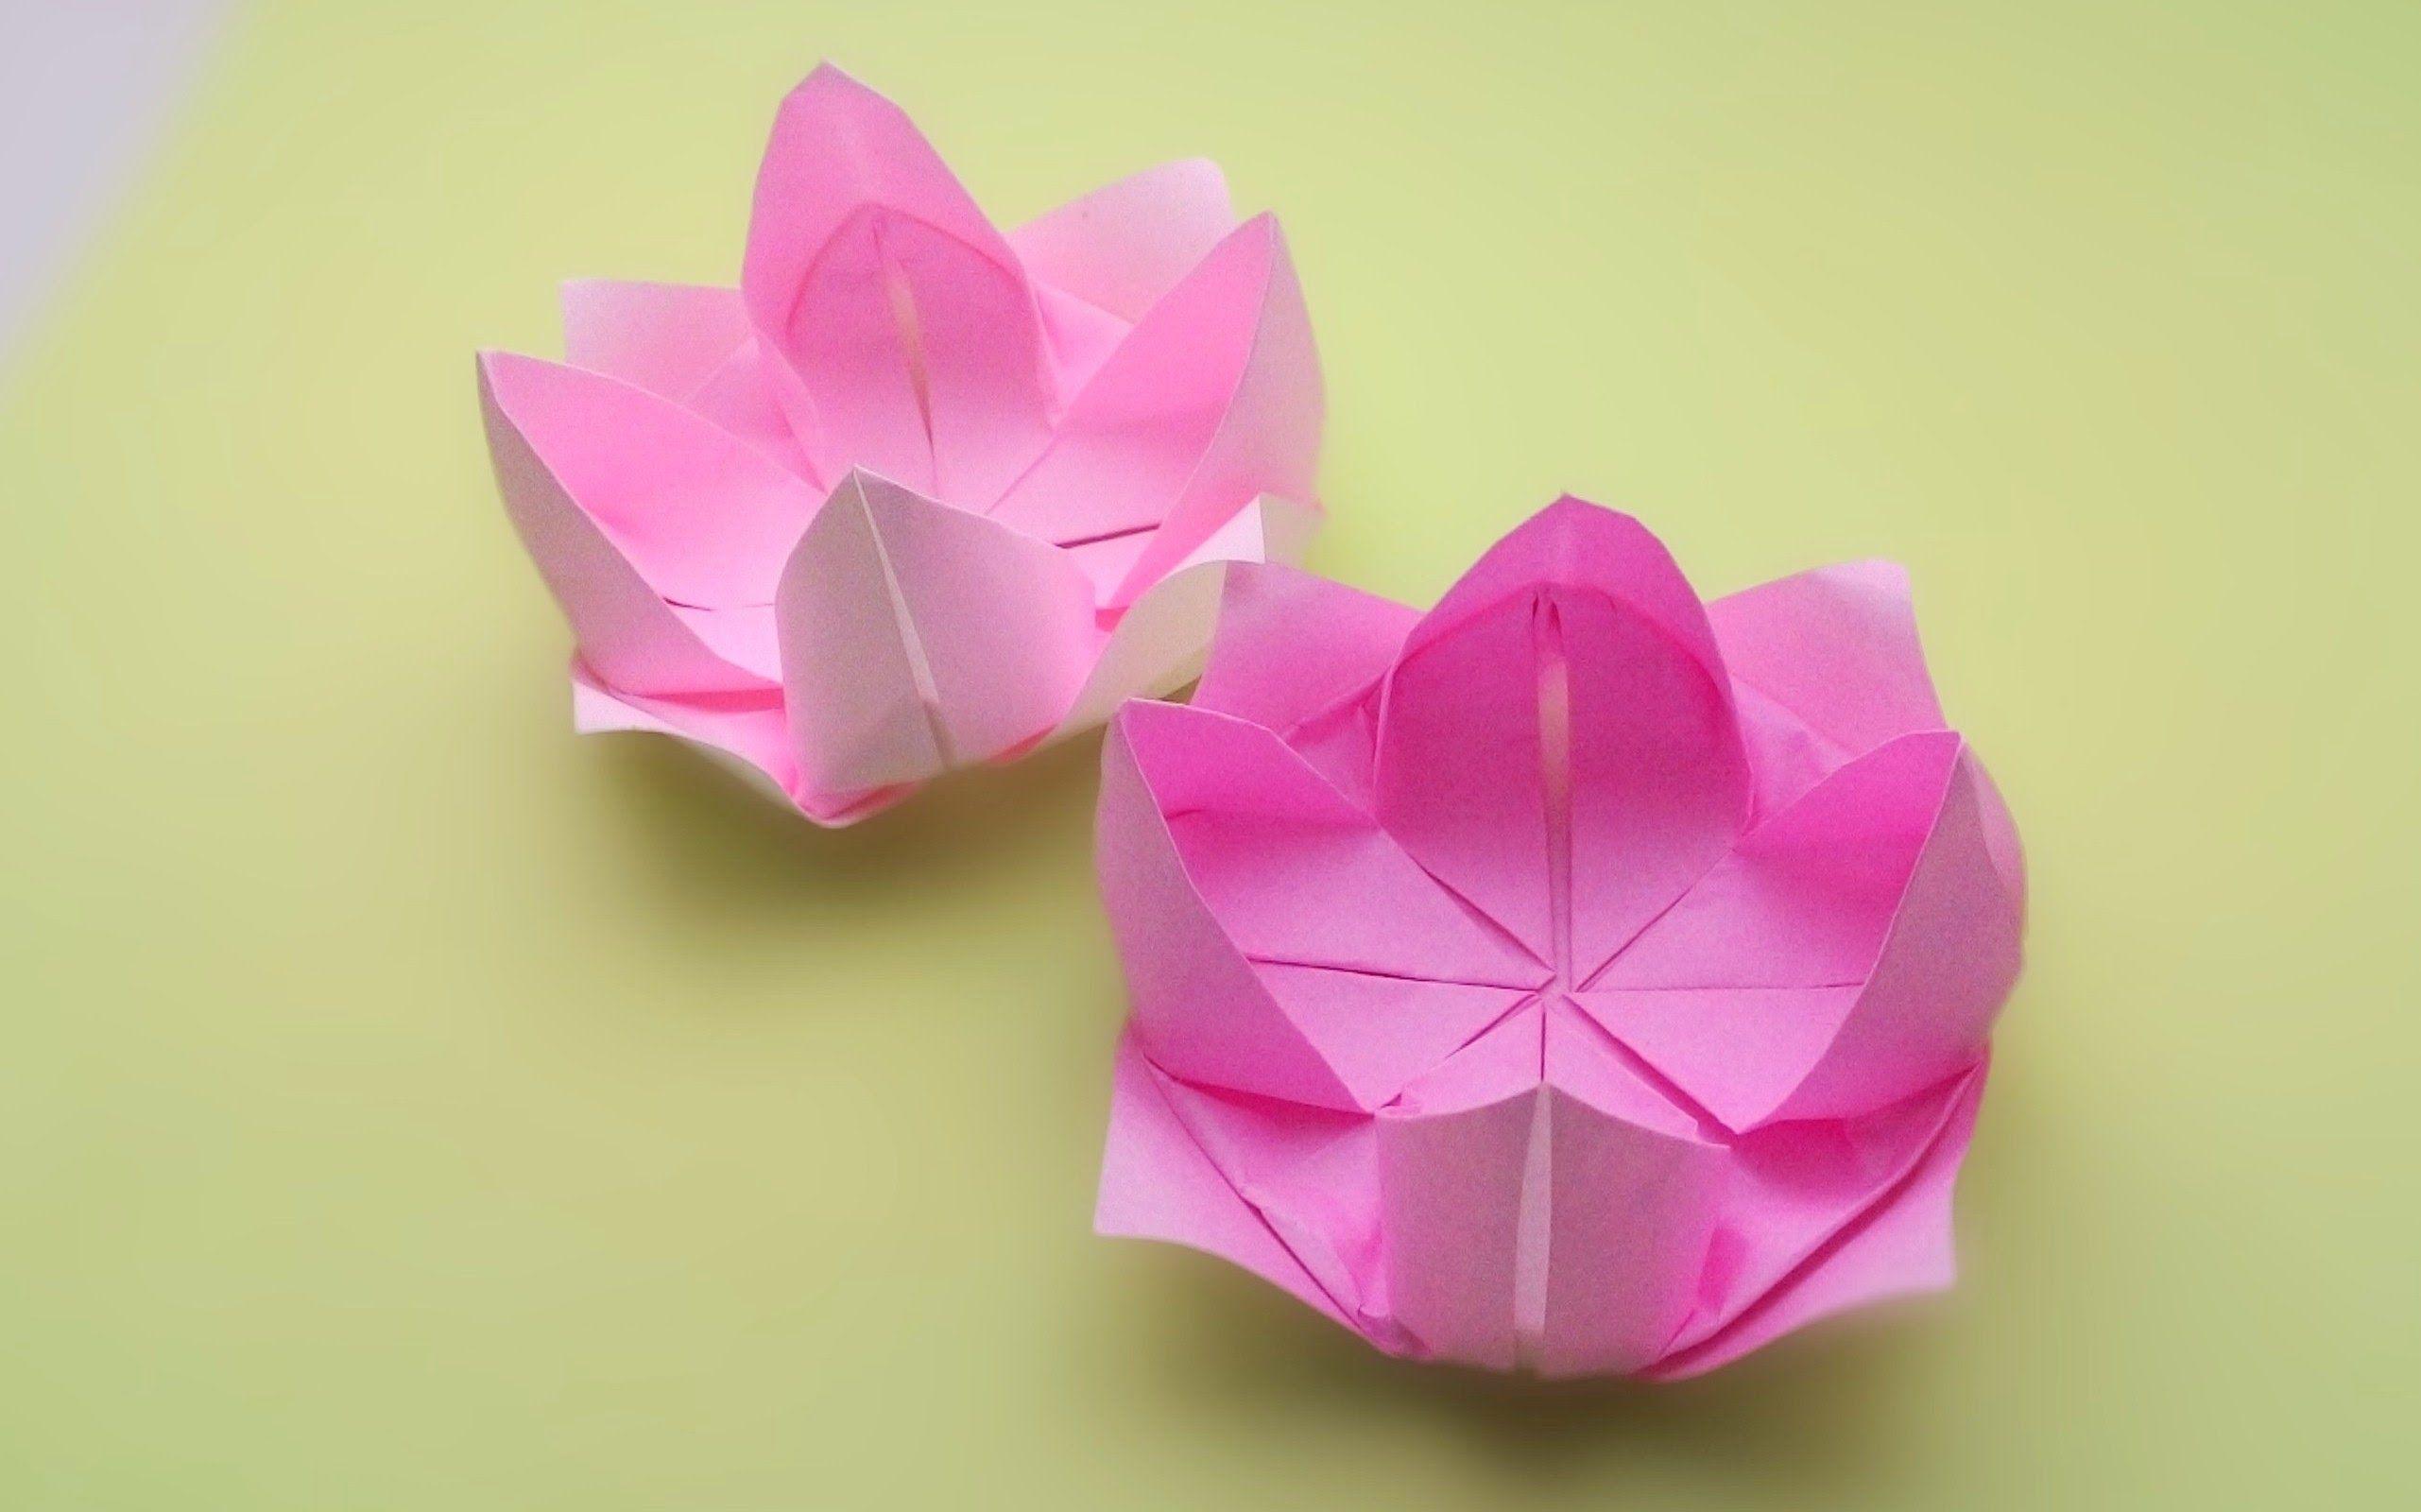 25 Origami Lotus Instructions Origami Origami Videos Paper Crafts